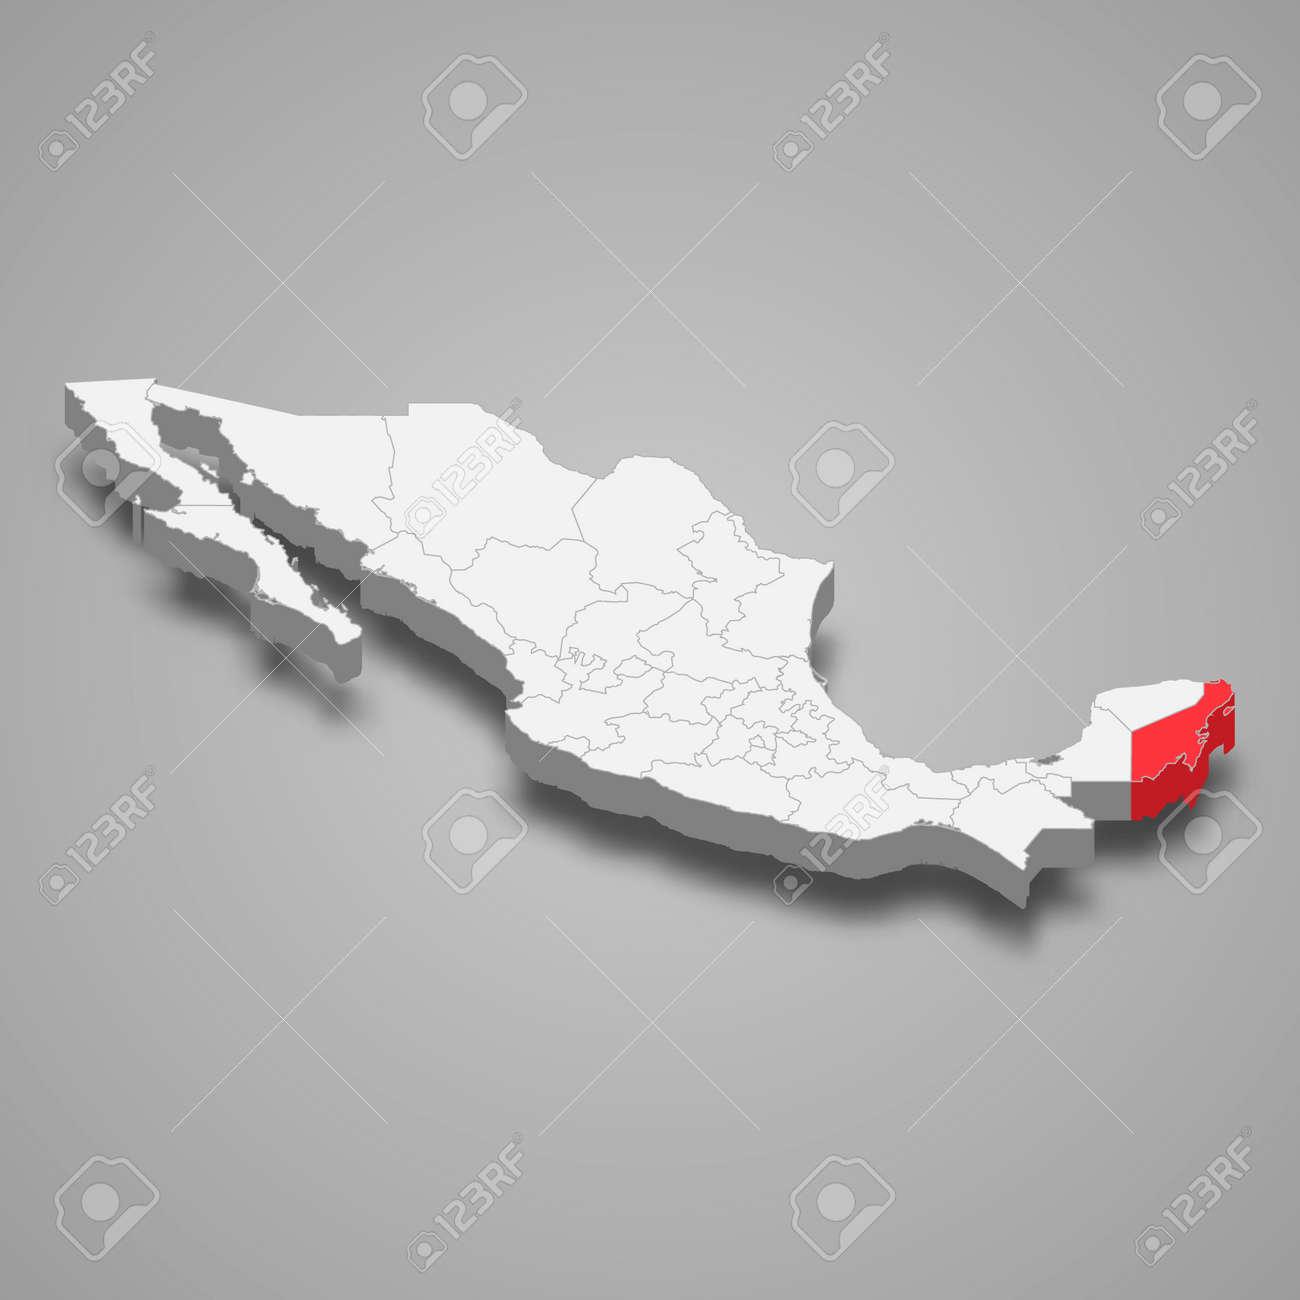 Quintana Roo region location within Mexico 3d isometric map - 168929068